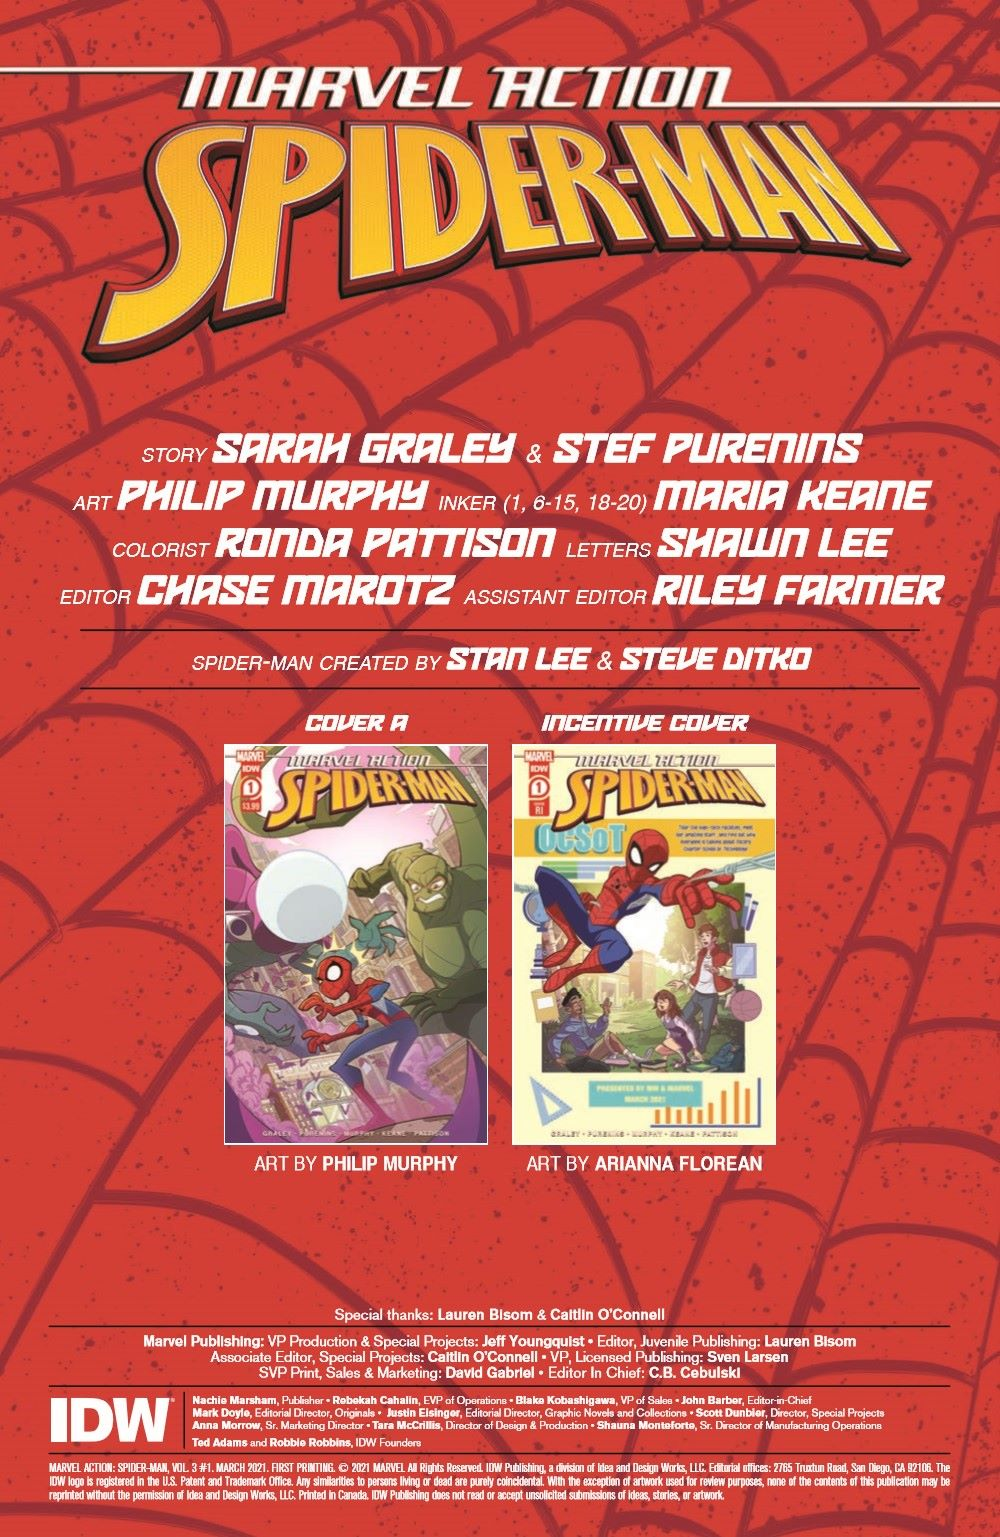 SpidermanV3-01_pr-2 ComicList Previews: MARVEL ACTION SPIDER-MAN VOLUME 3 #1